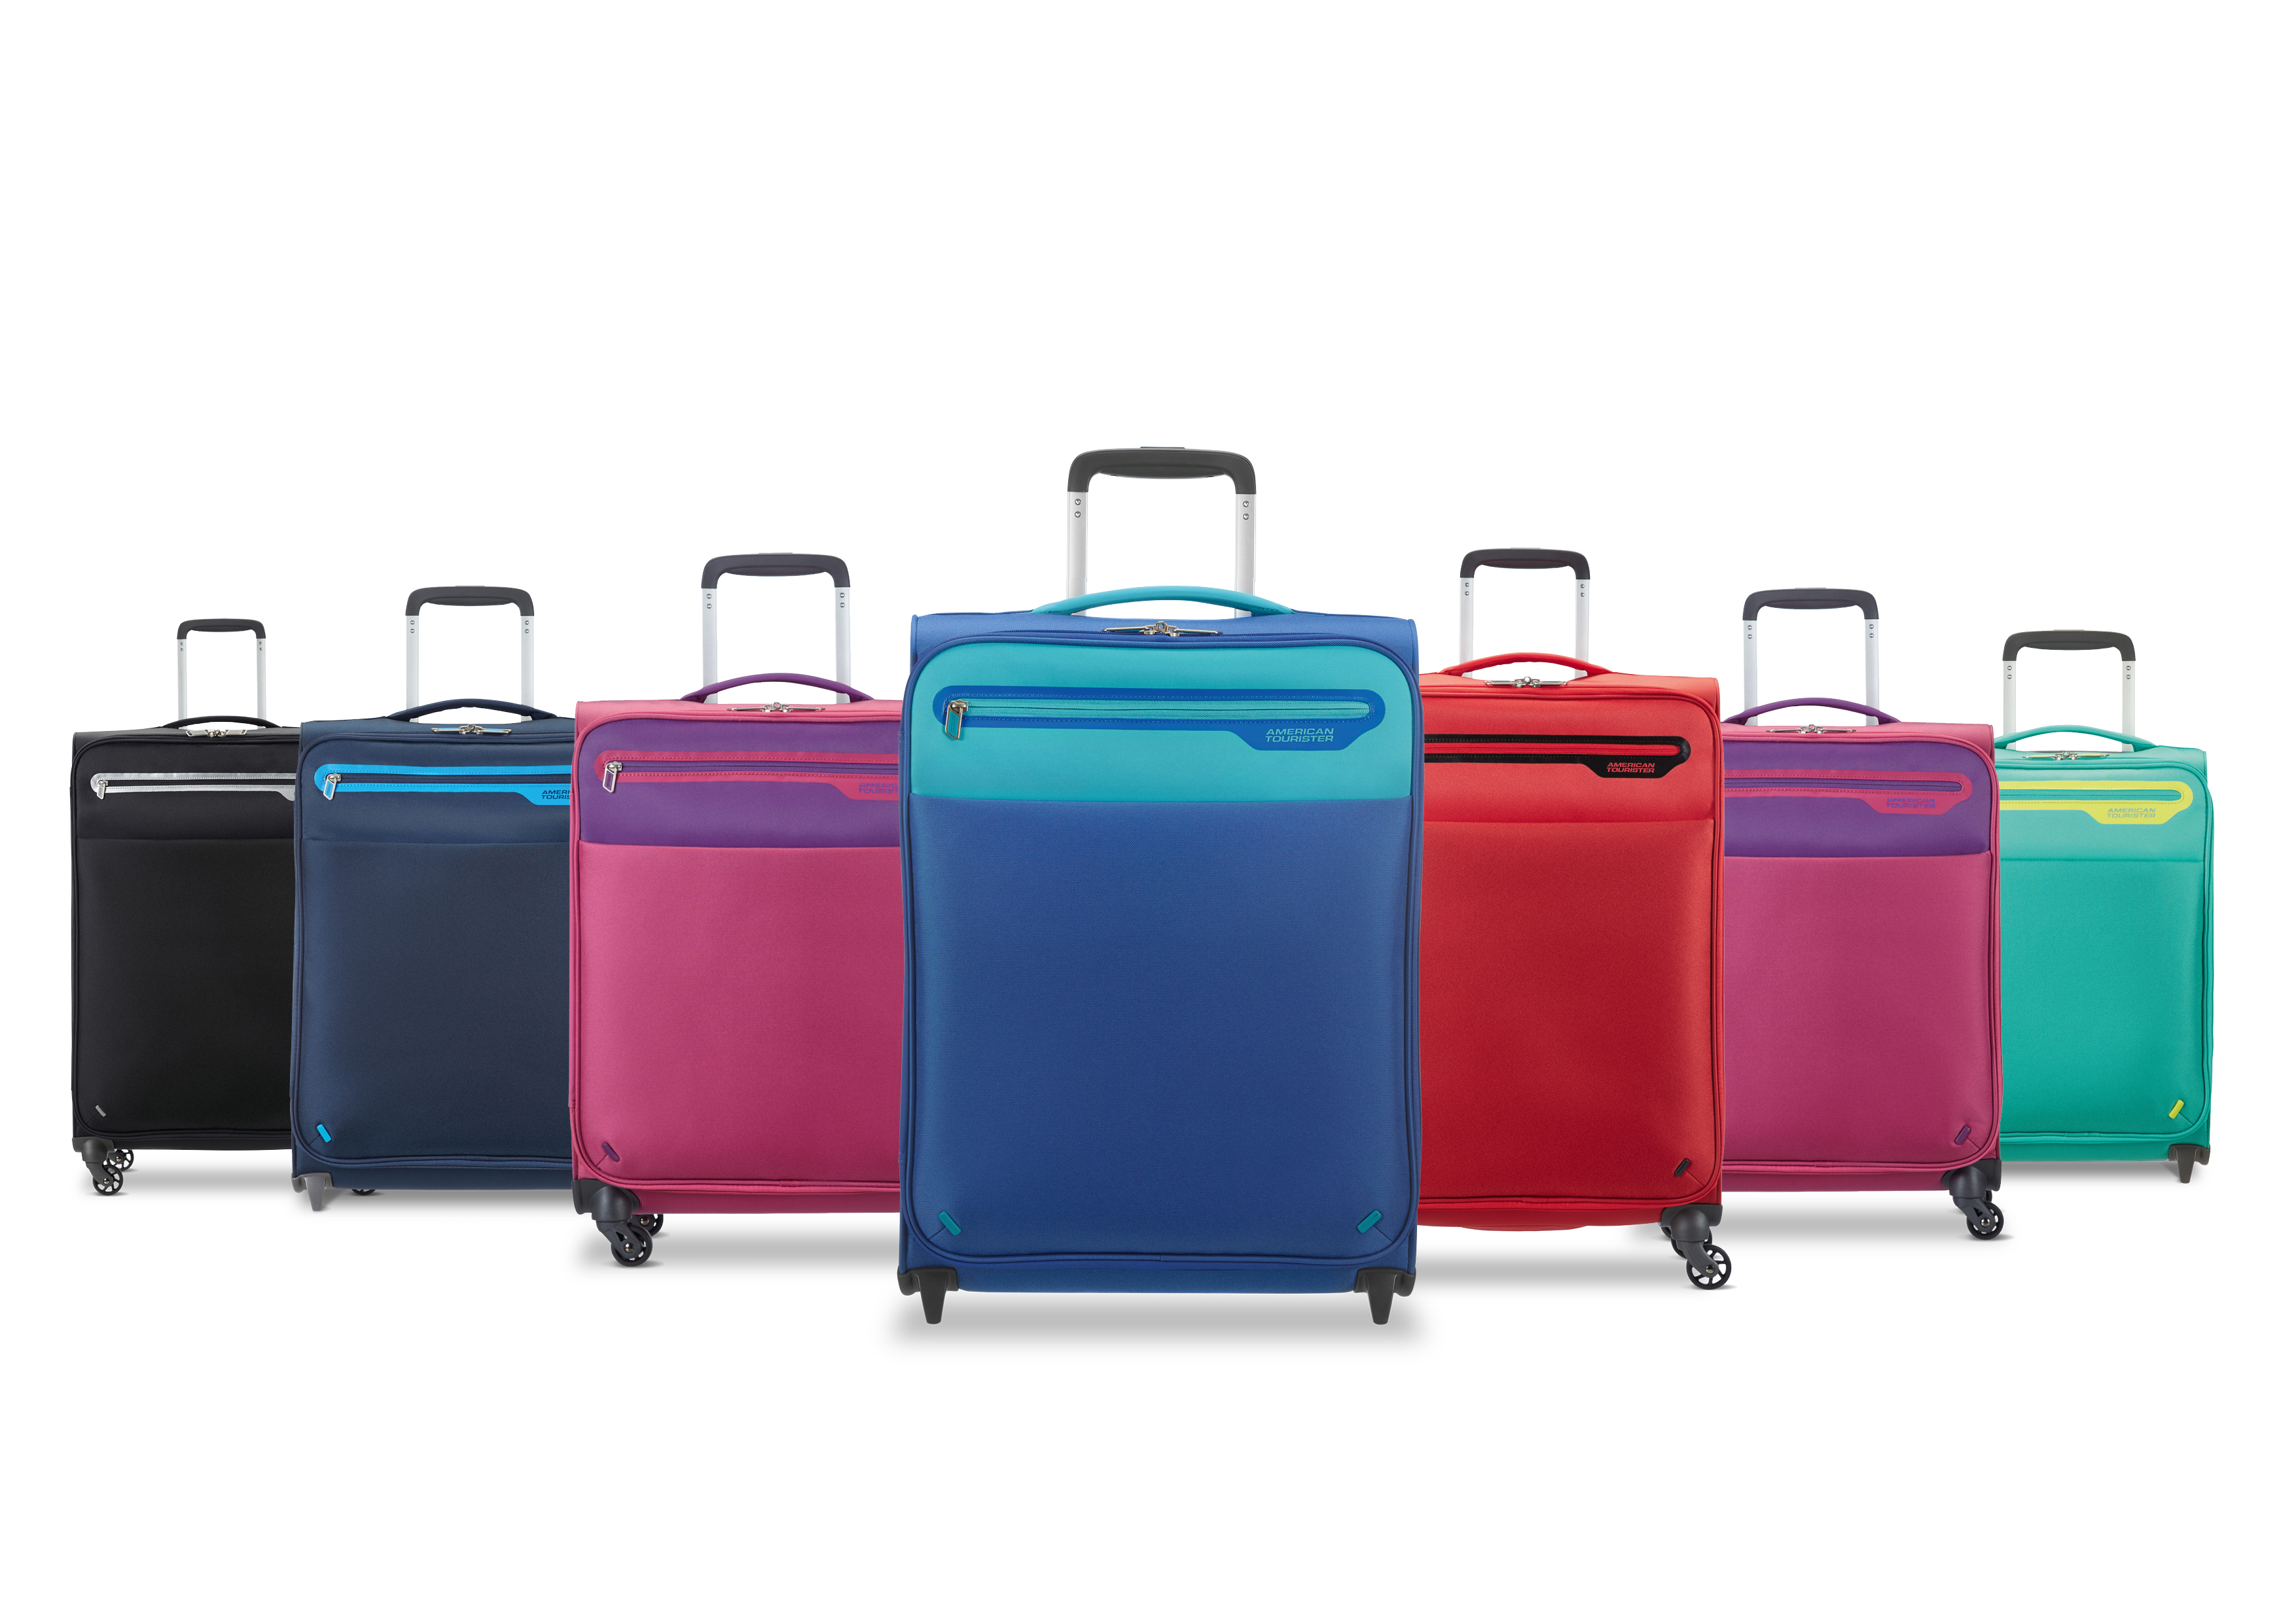 Light Travel Luggage Reviews